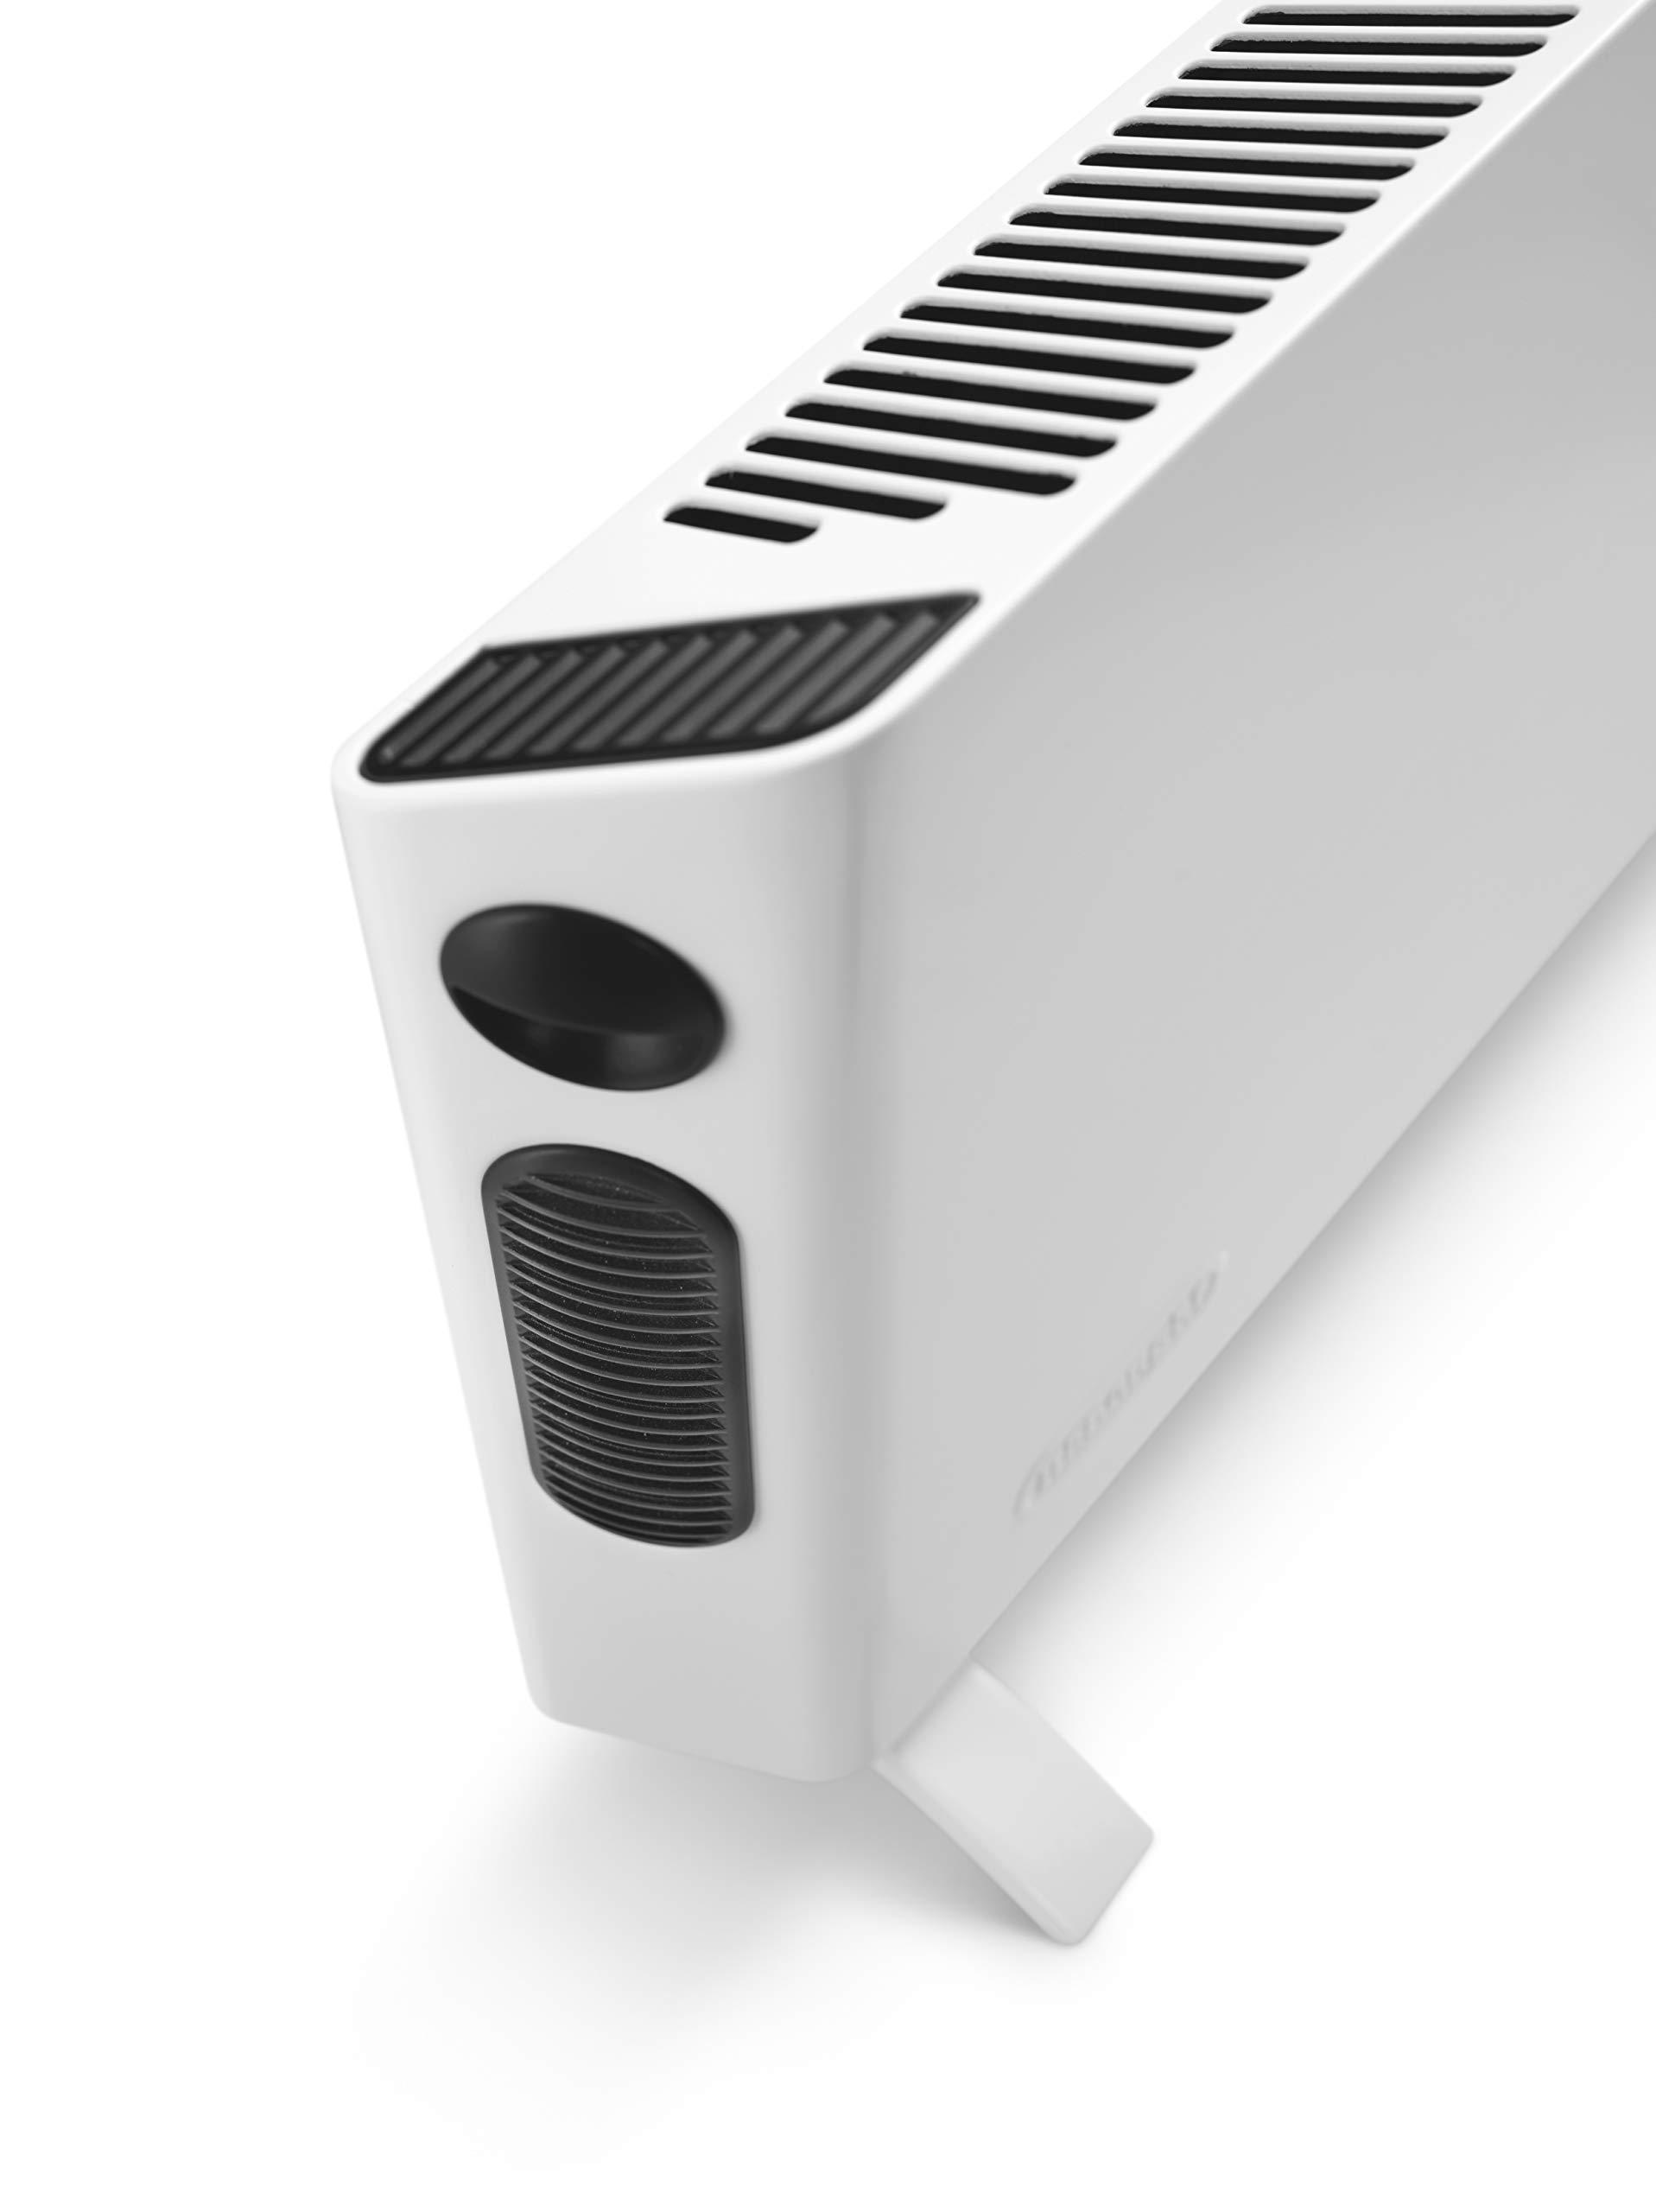 Delonghi HSX2320 2.0 kW Slim Convector Heater